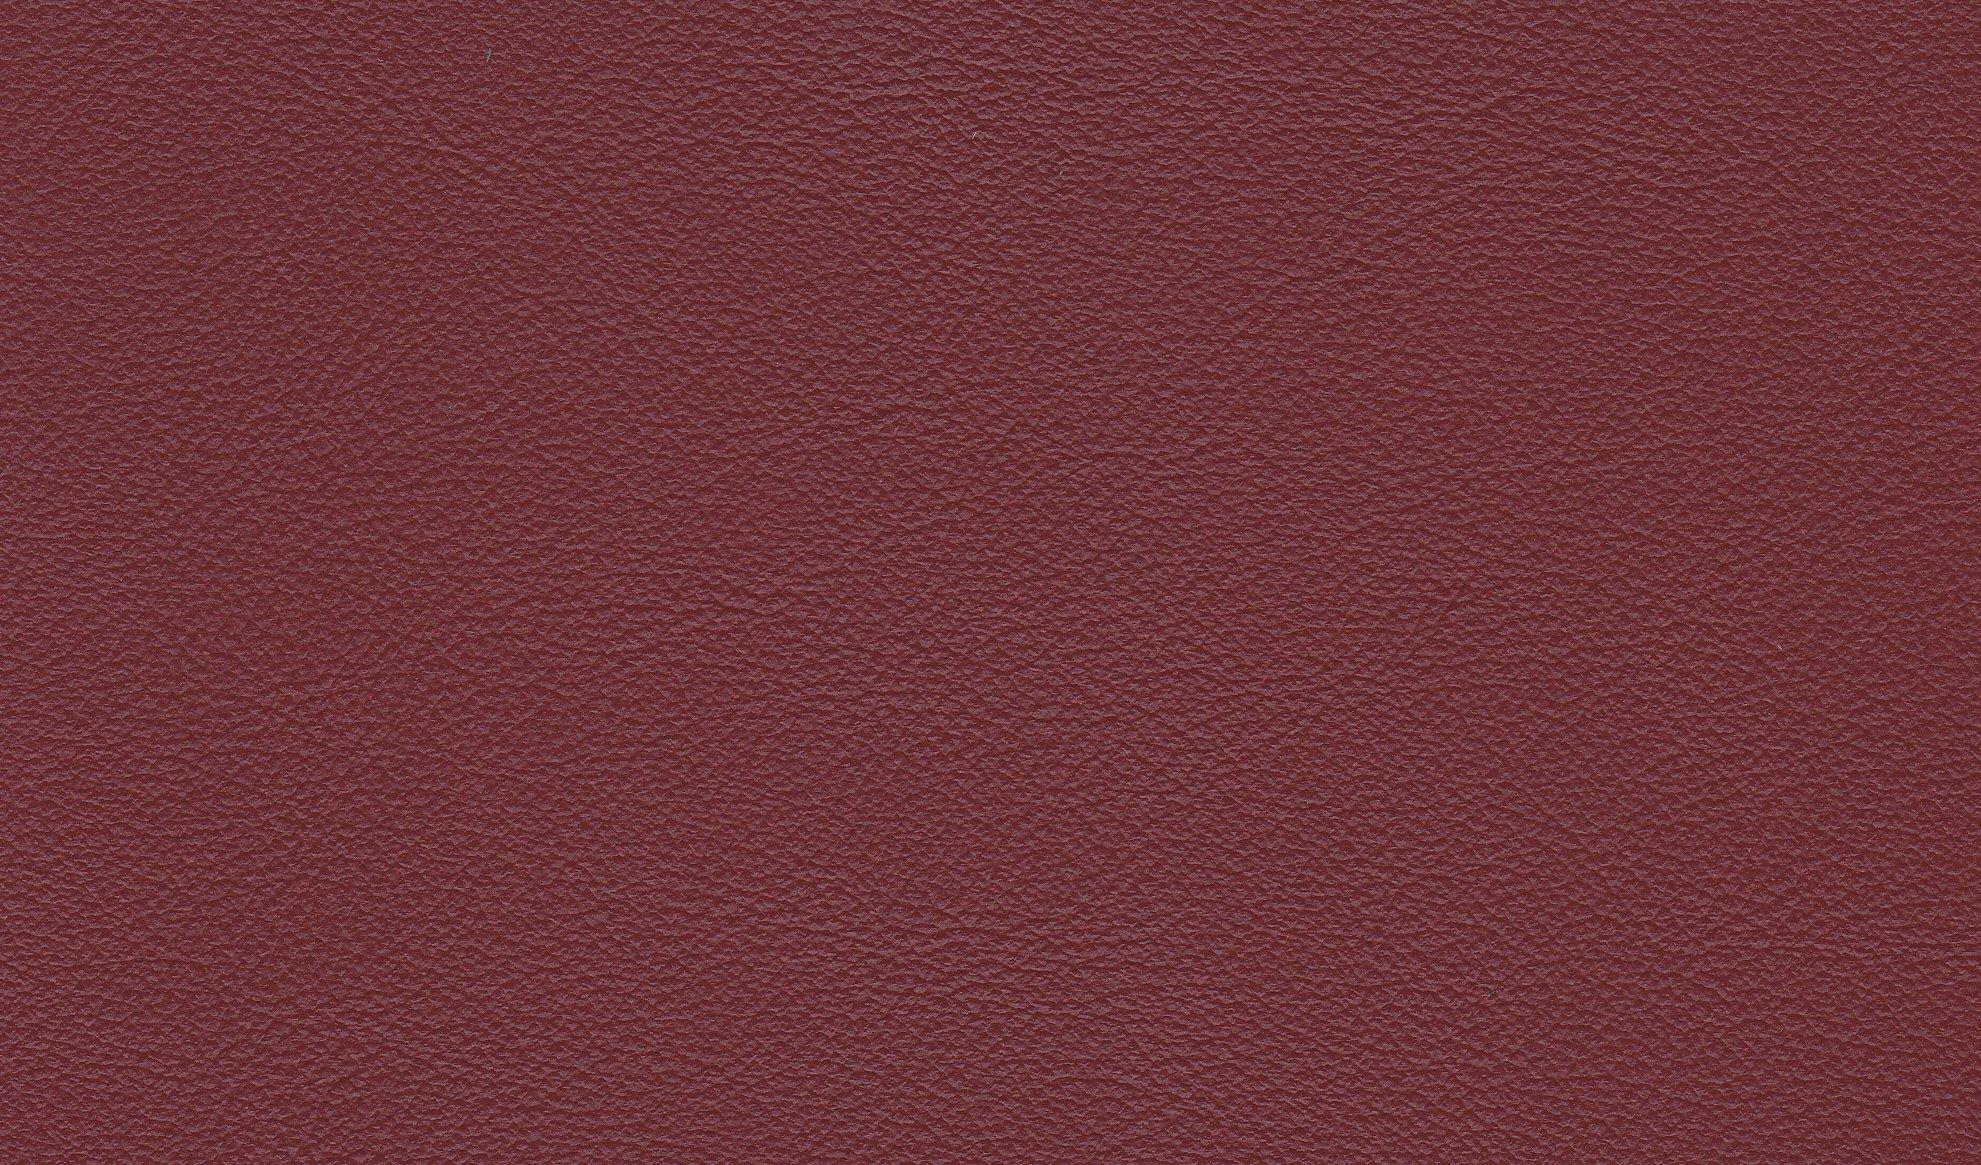 Pinjara medici leather